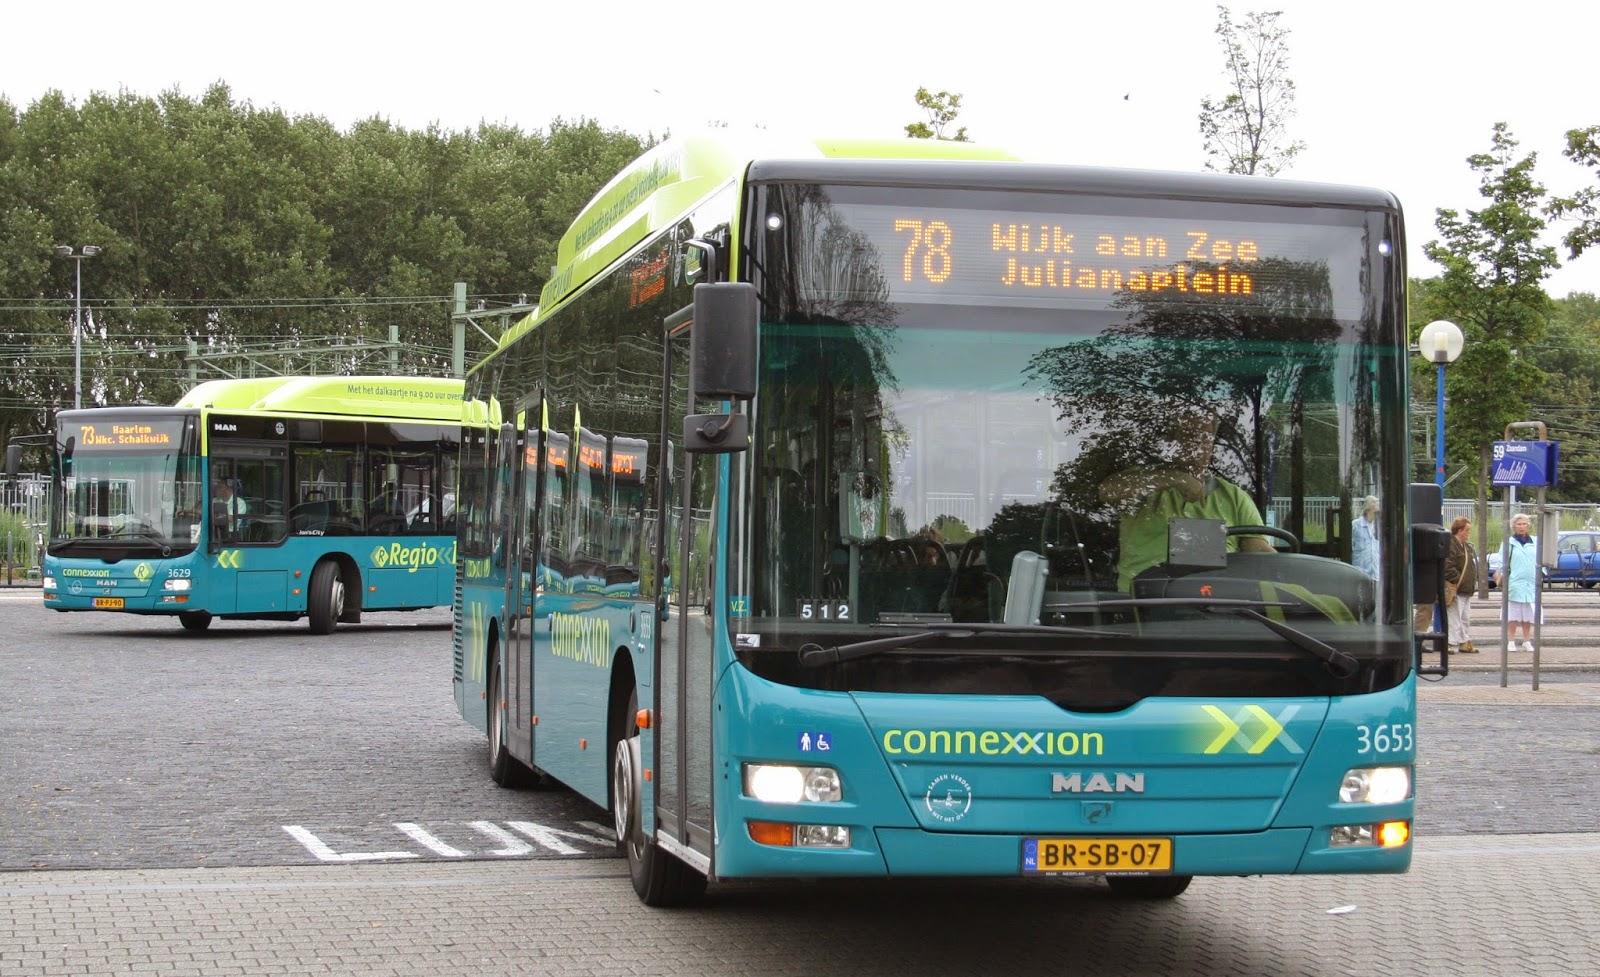 openbaar busvervoer haarlem amsterdam